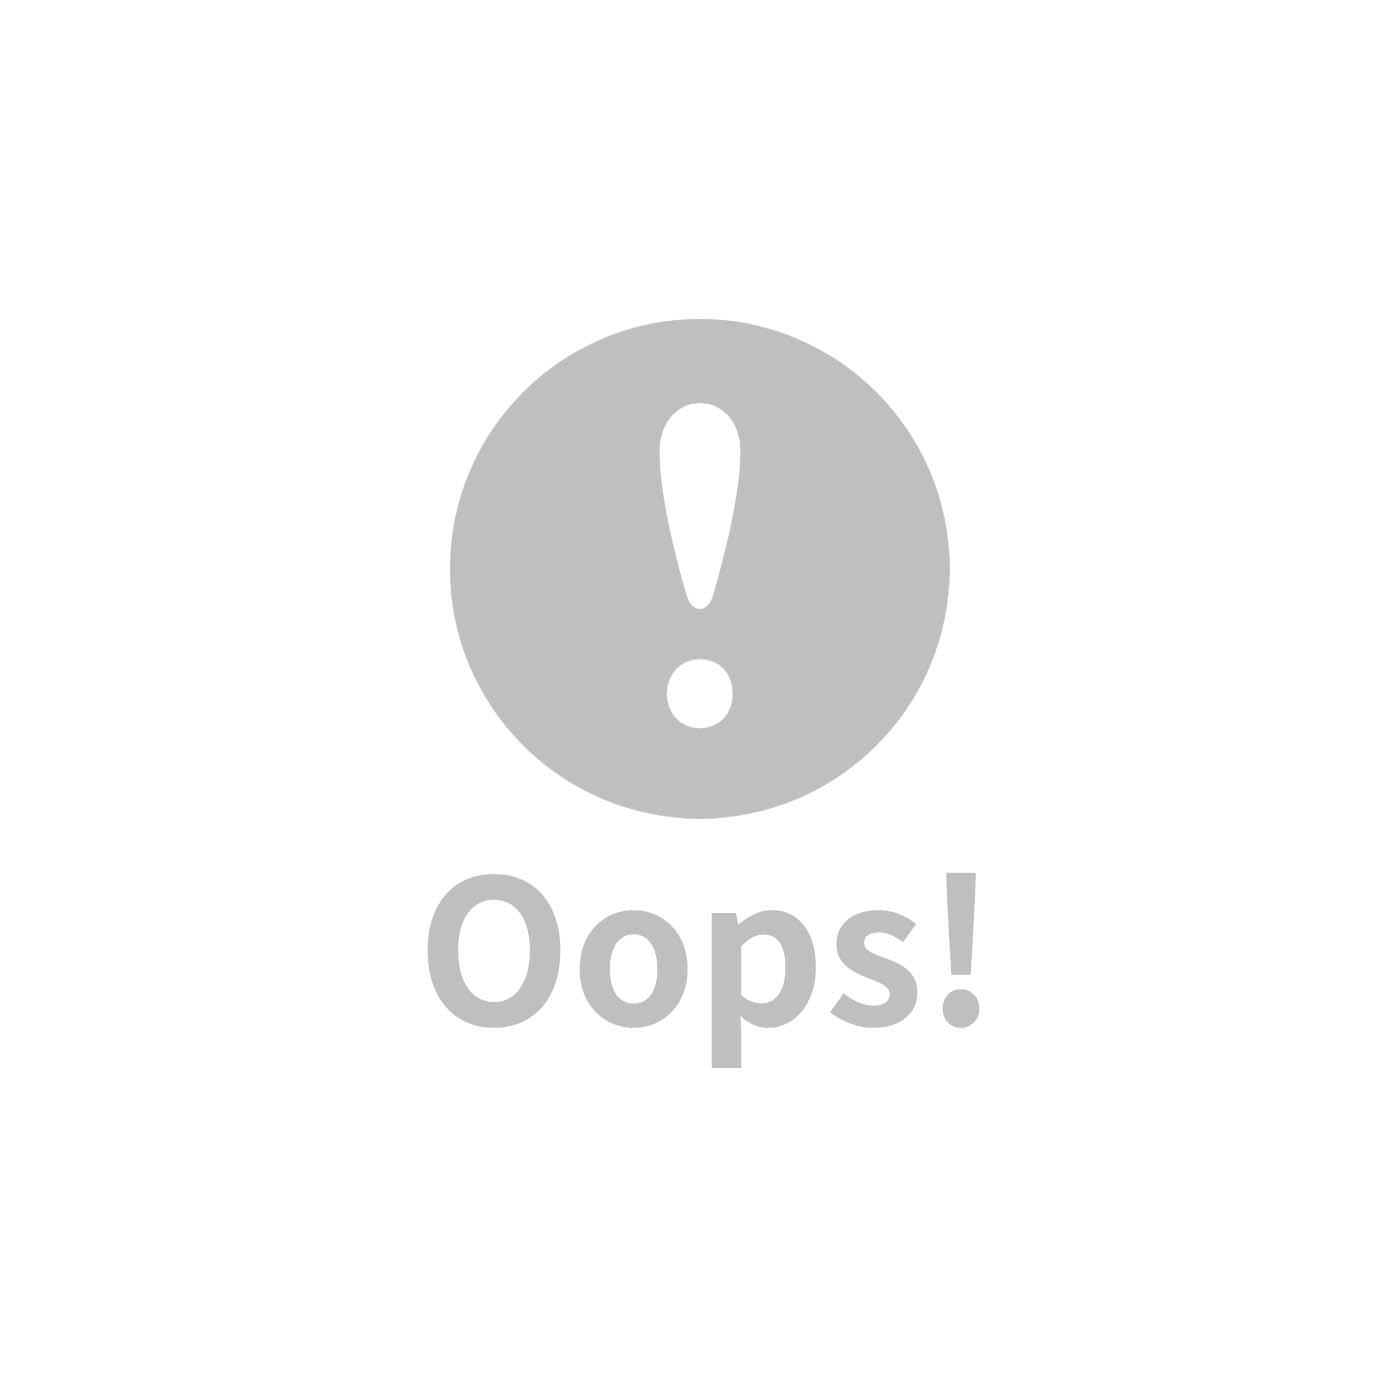 air cossi透氣抗菌天絲推車坐墊-頭頸支撐款(4m-3y)(清新綠)(綁帶款)